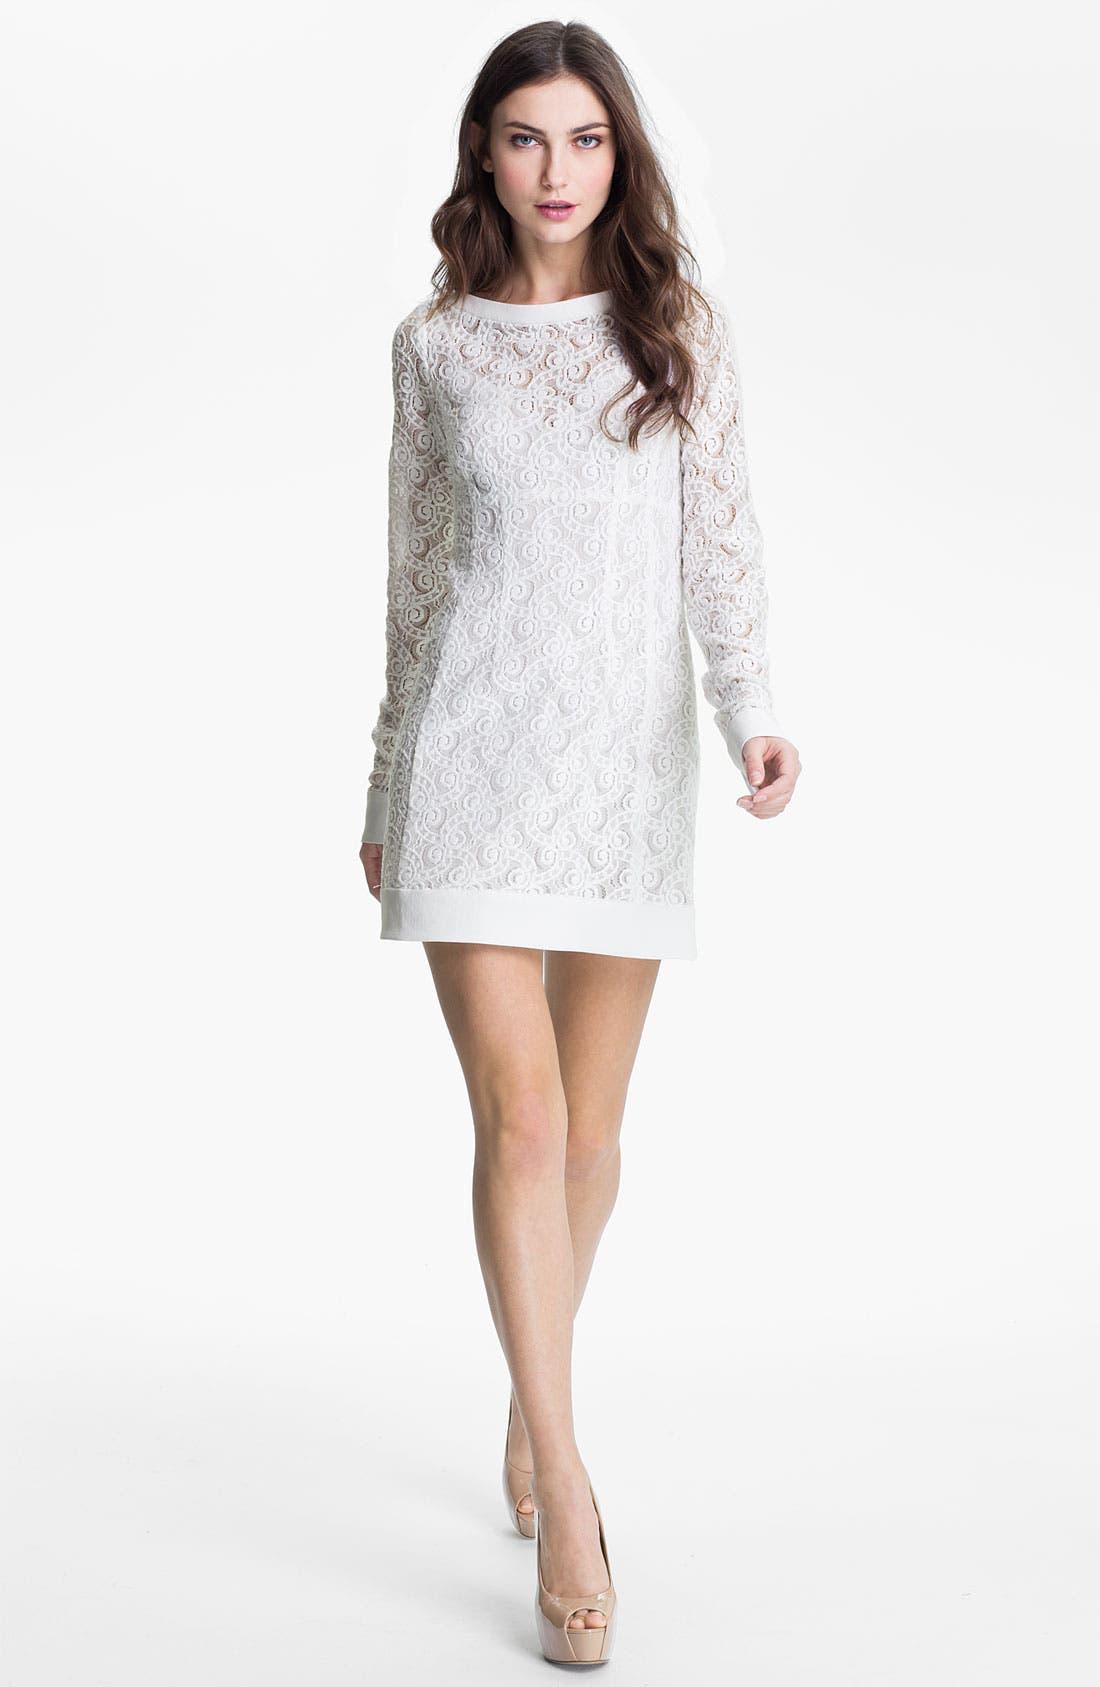 Main Image - Nanette Lepore 'Lithograph' Lace Shift Dress